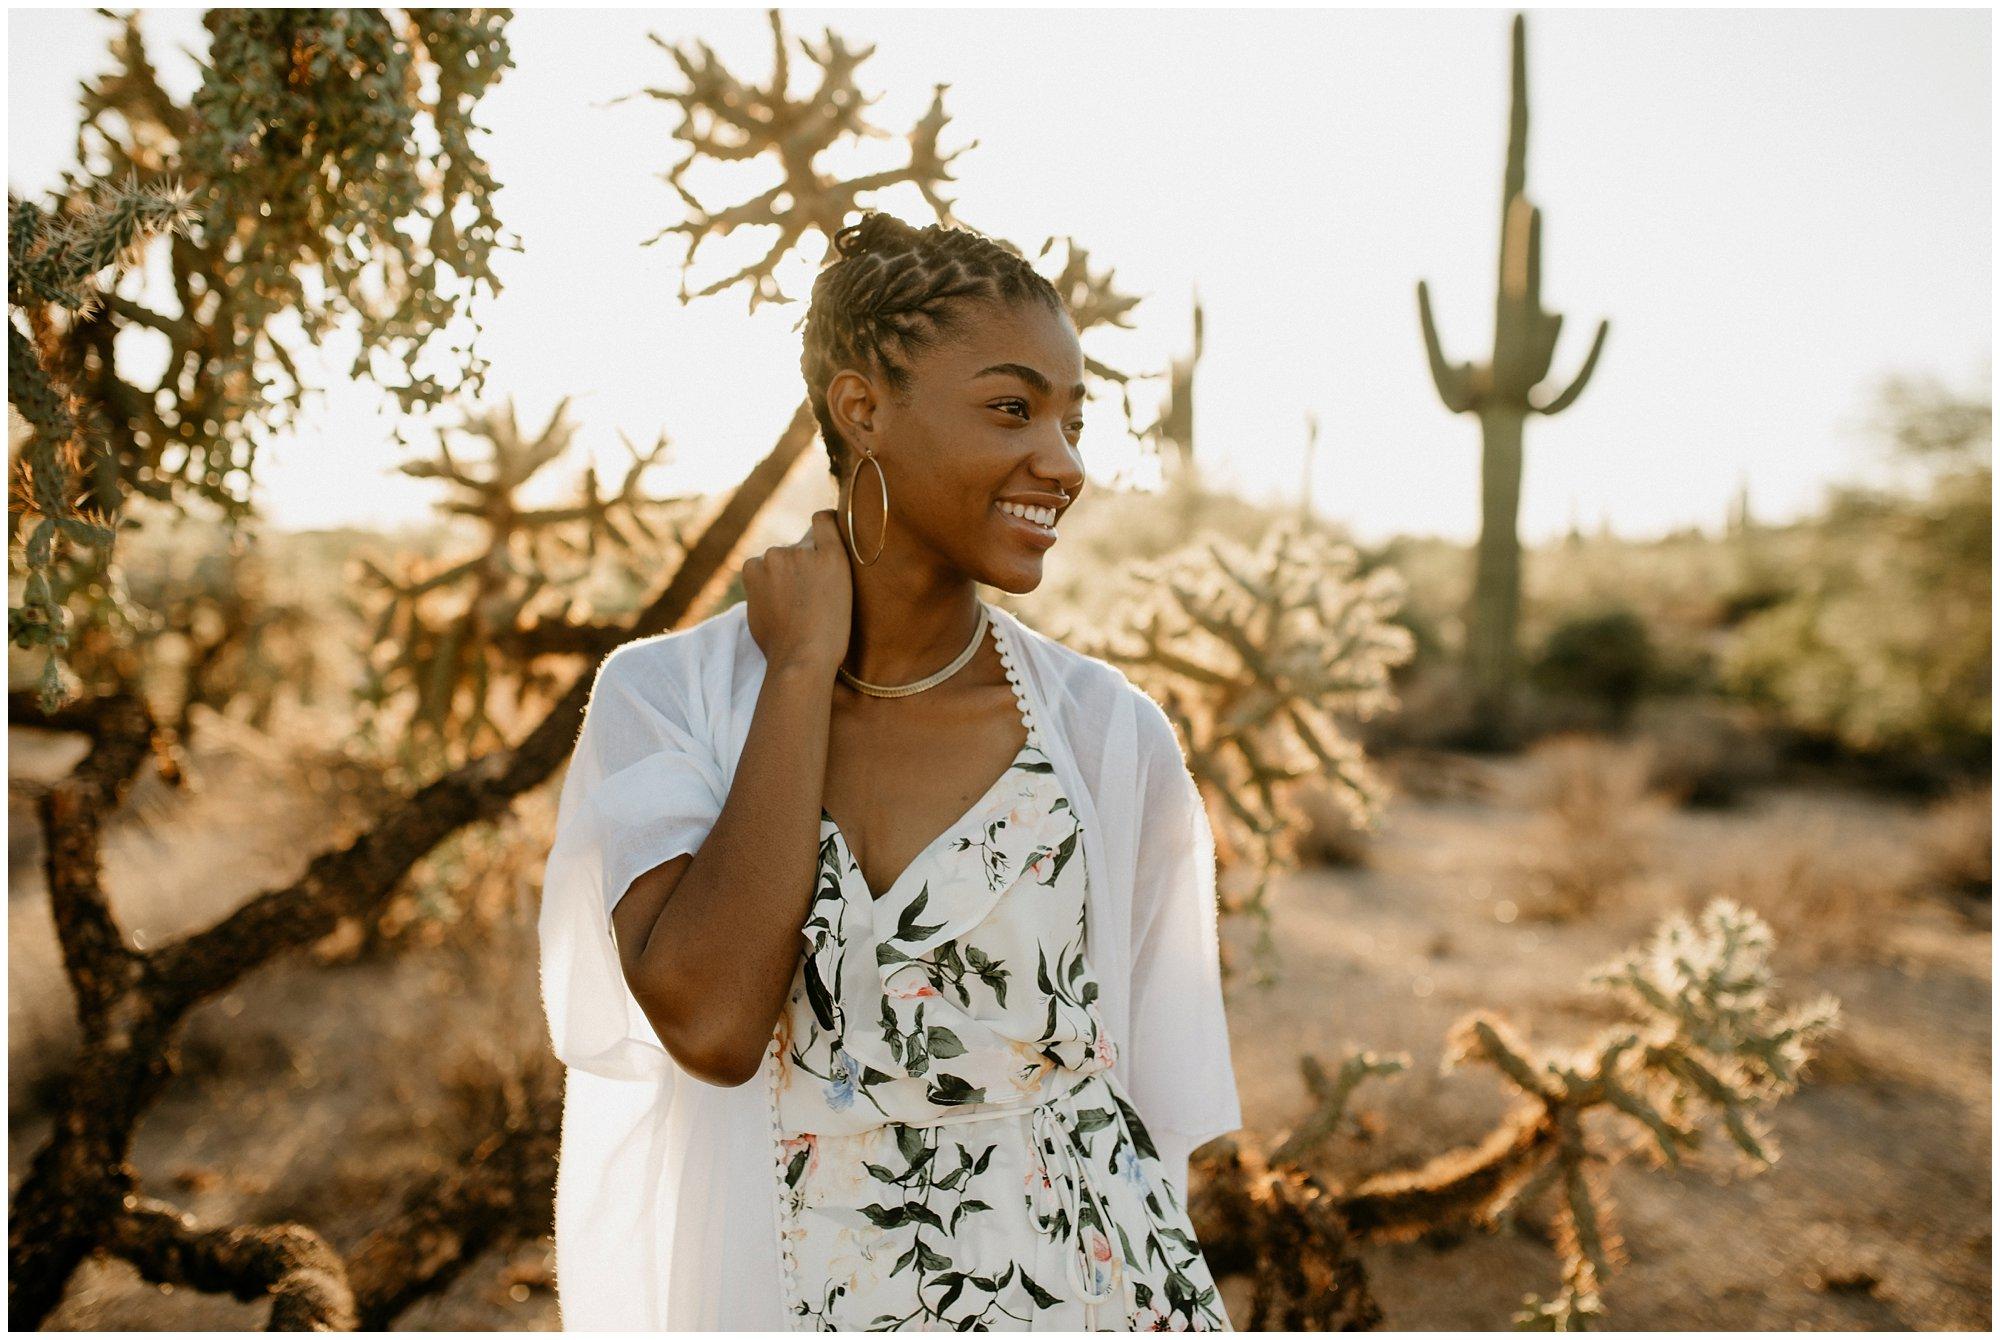 Desert Model Portrait Session - Ashtyn Nicole Photo_0014.jpg